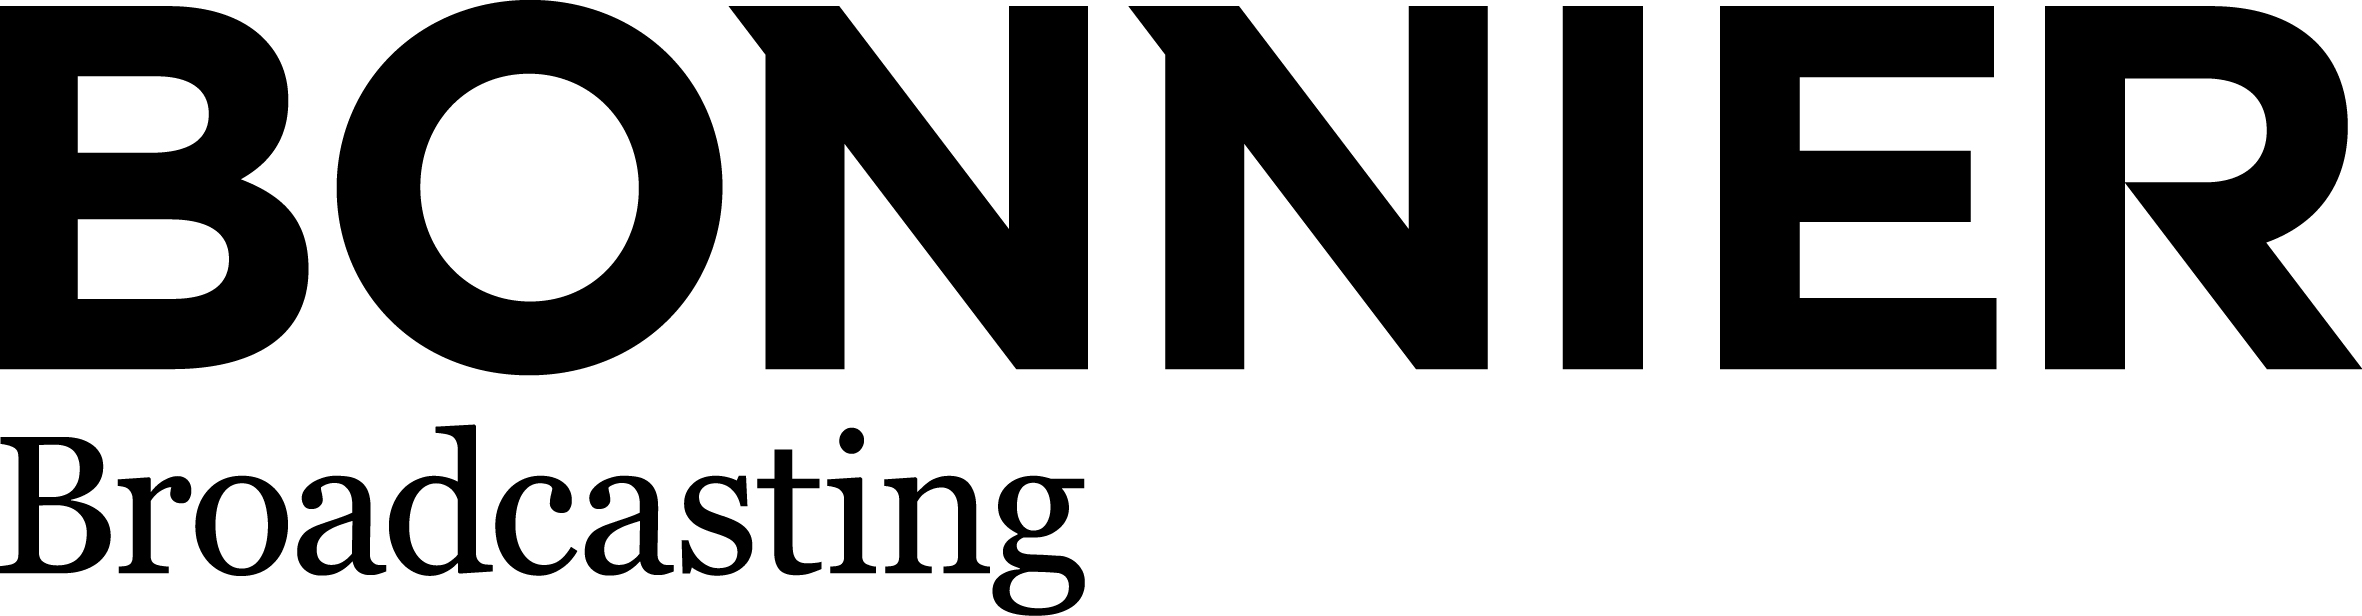 Bonnier Broadcasting